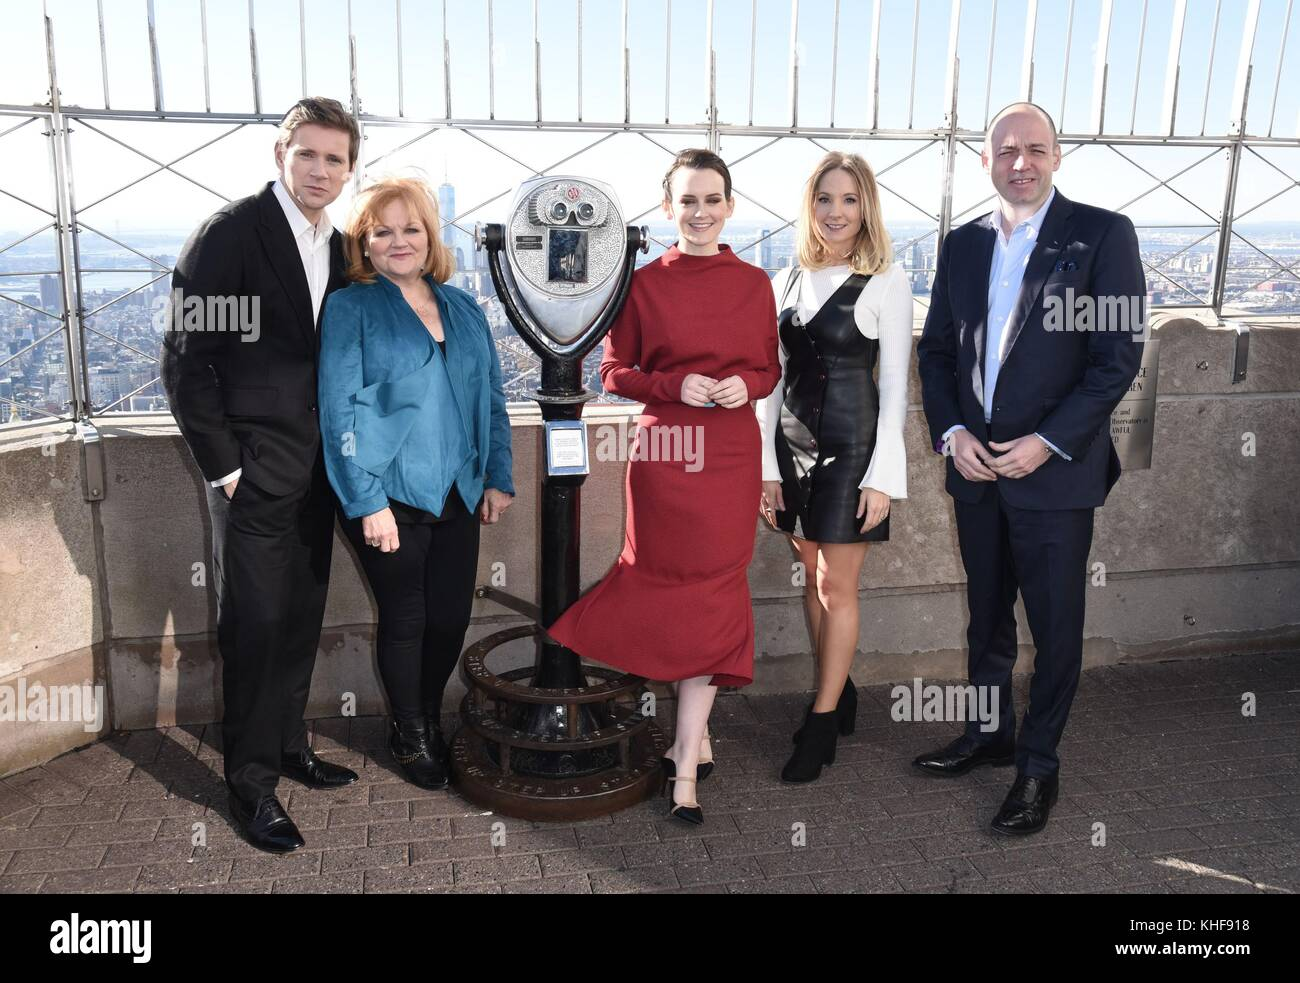 New York, NY, USA. 17th Nov, 2017. Allen Leech, Lesley Nicol, Sophie McShera, Joanne Froggatt, Gareth Neame at a - Stock Image